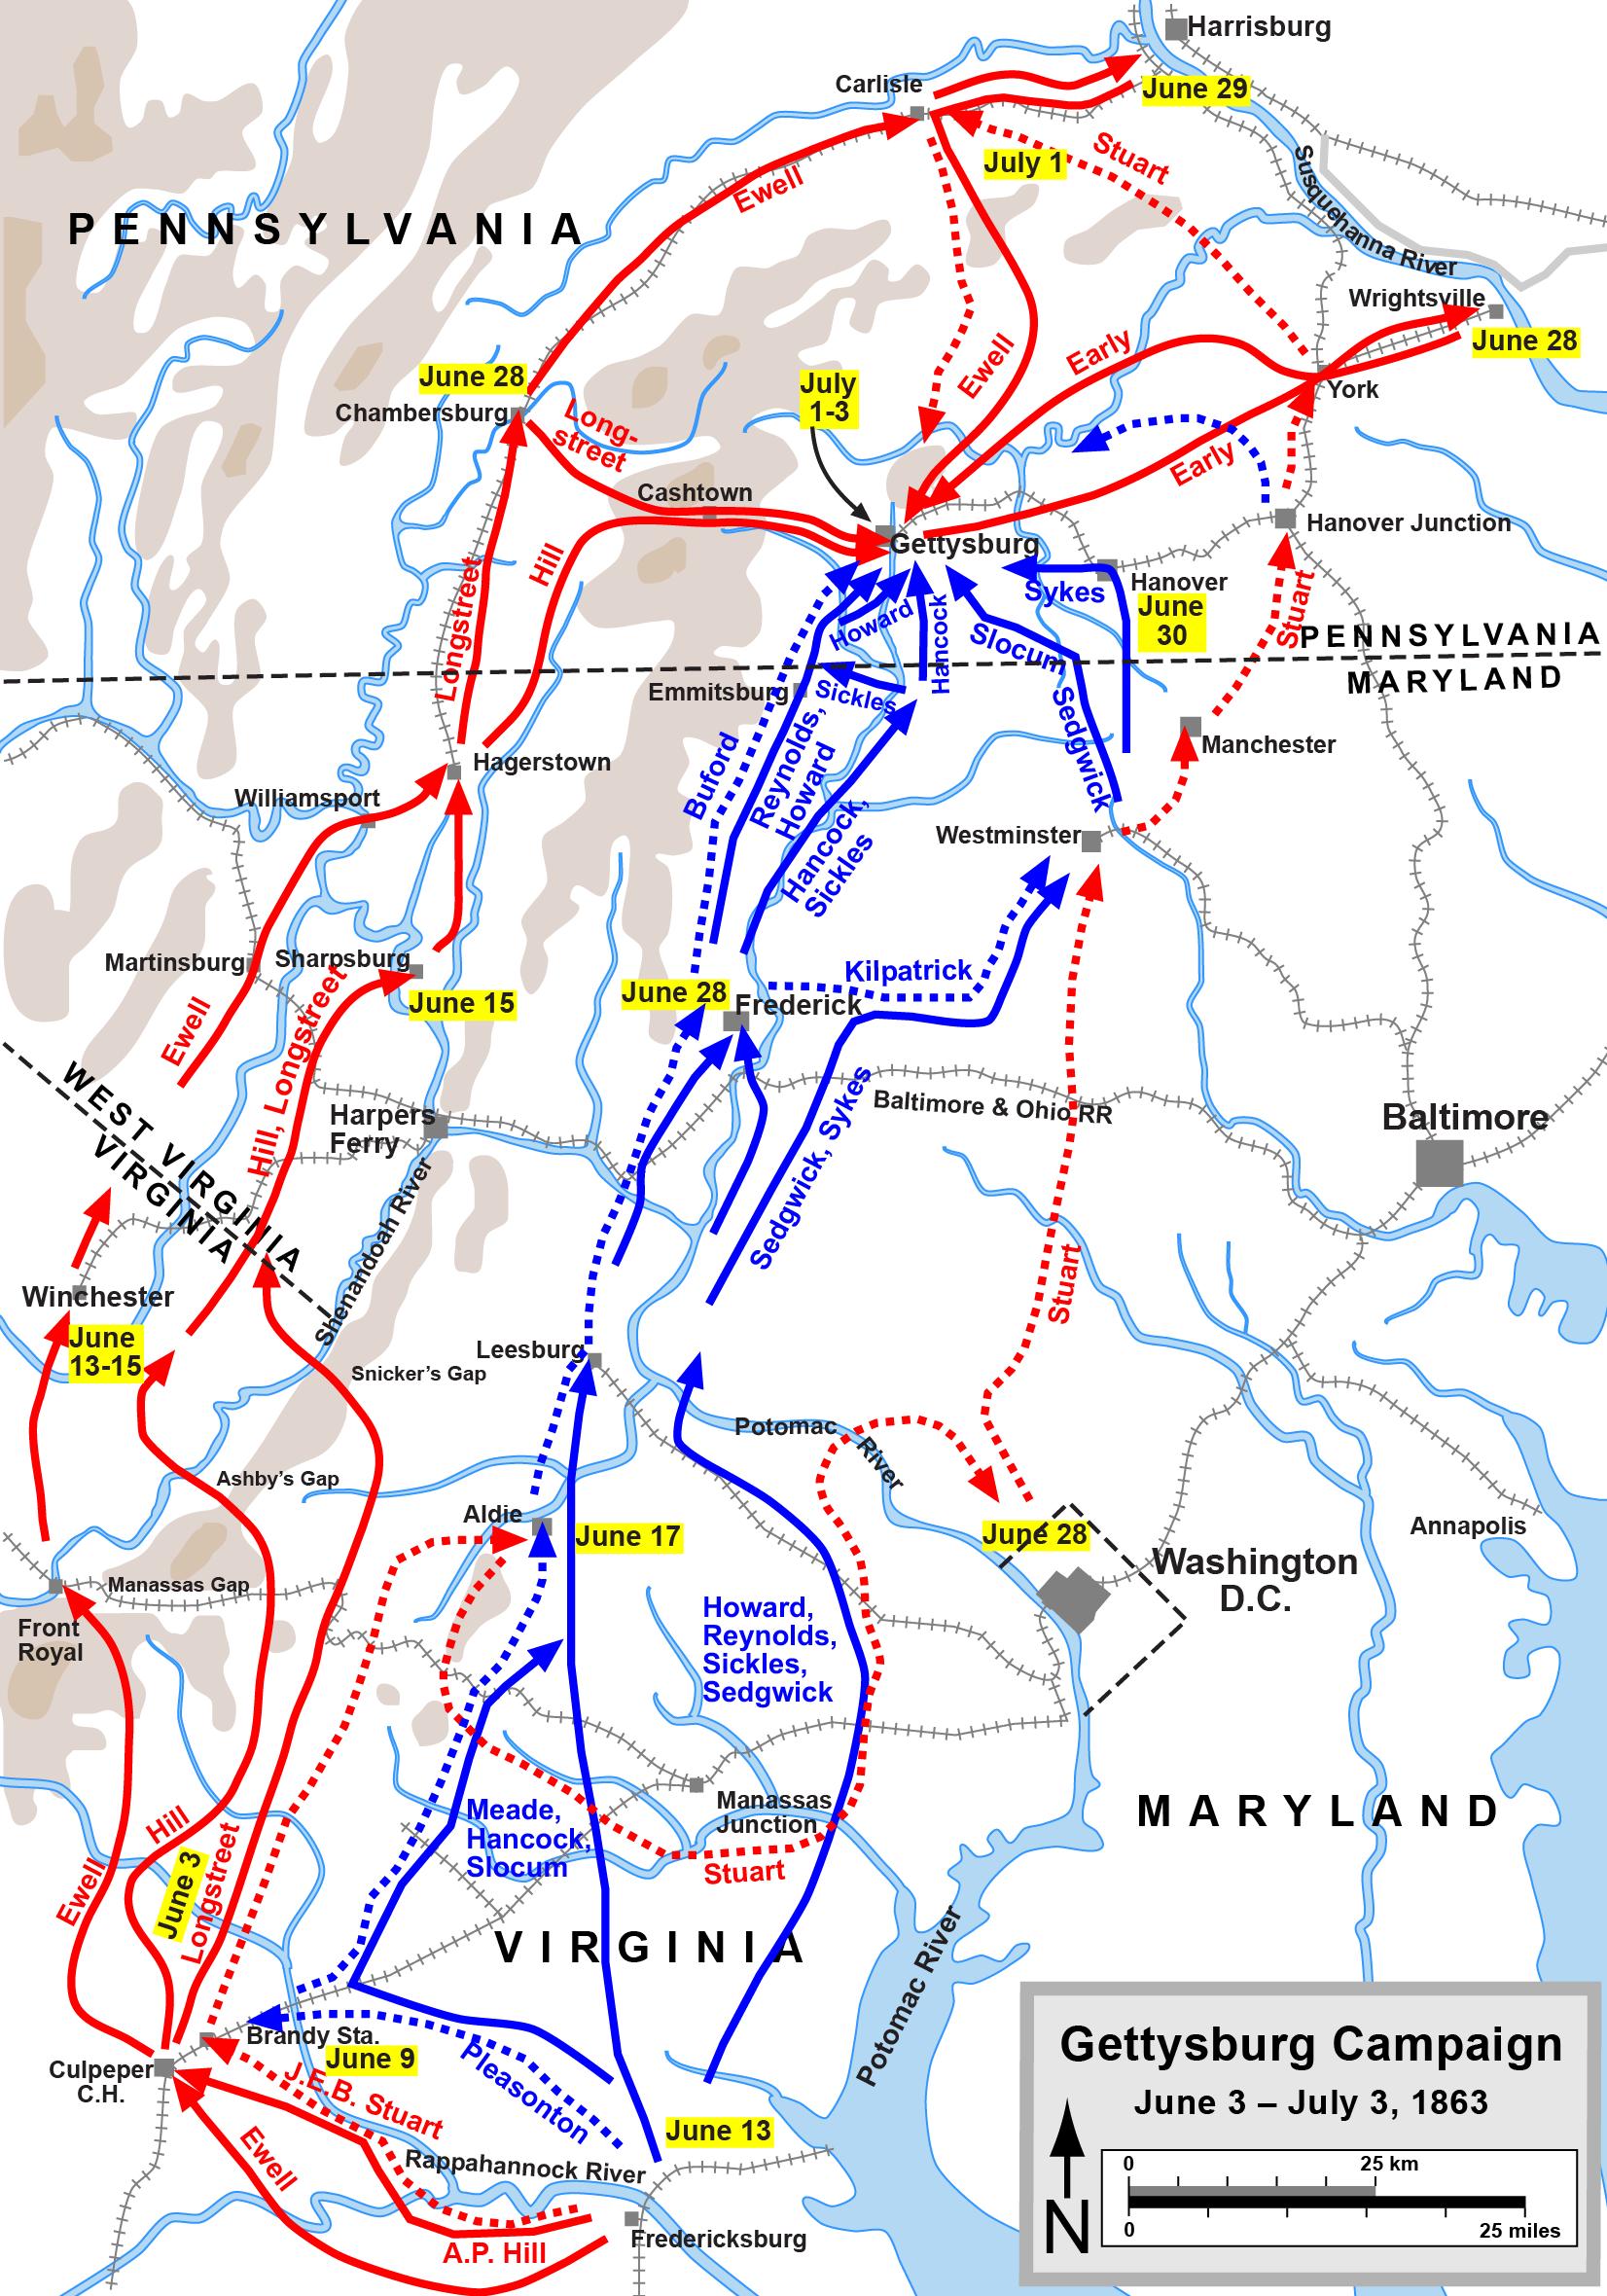 Maps That Explain The American Civil War Gettysburg Civil - Gettysburg on a map of the us